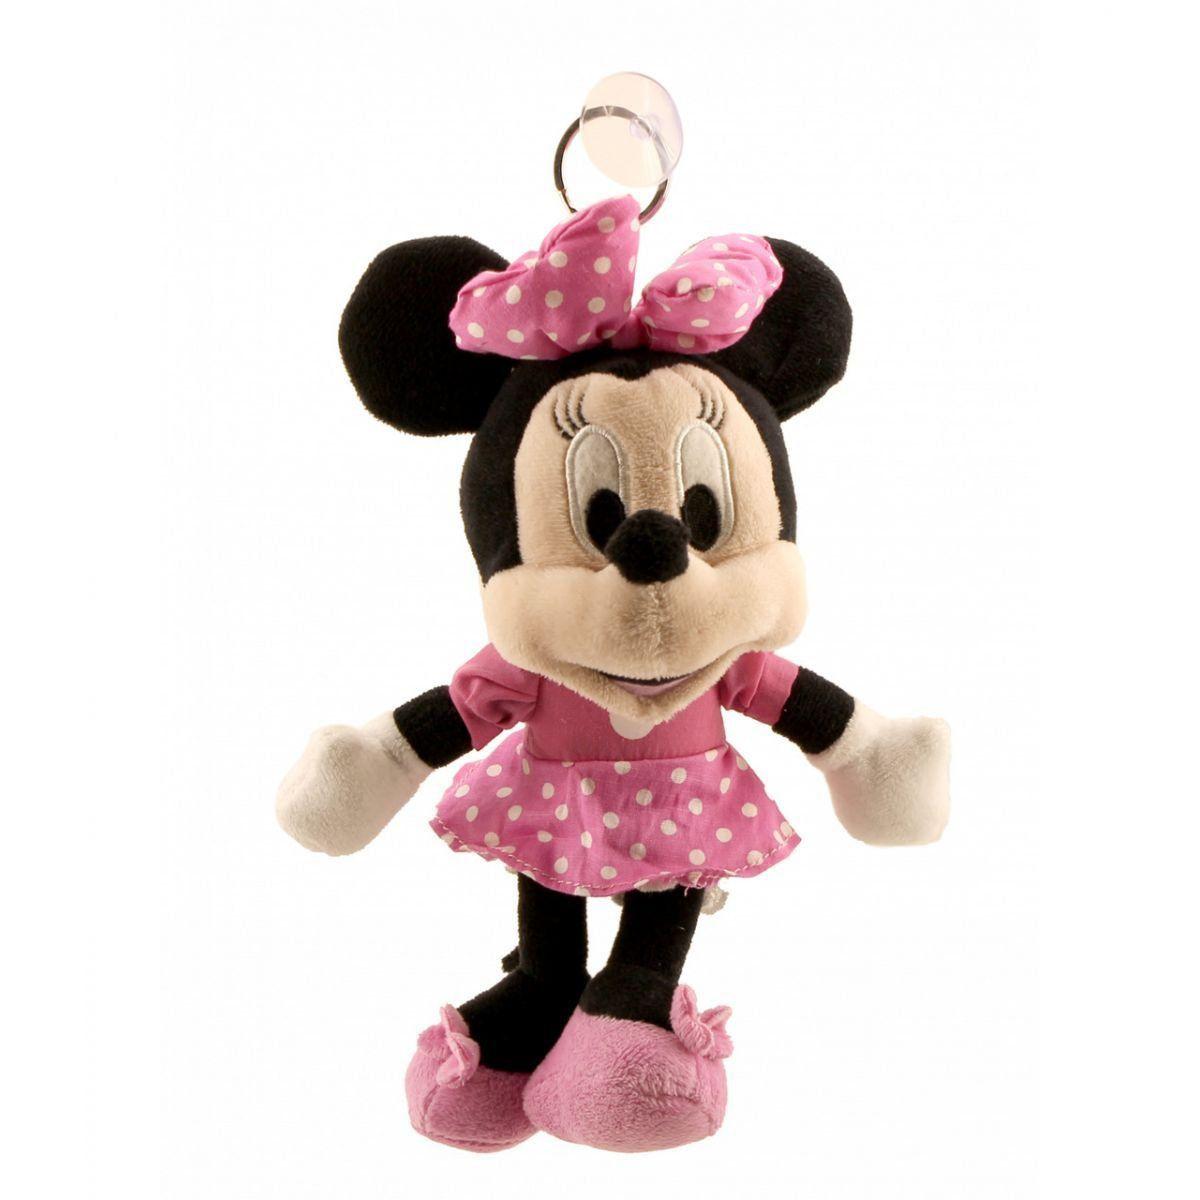 Chaveiro Boneca Minnie Mouse Rosa na Lata - Disney